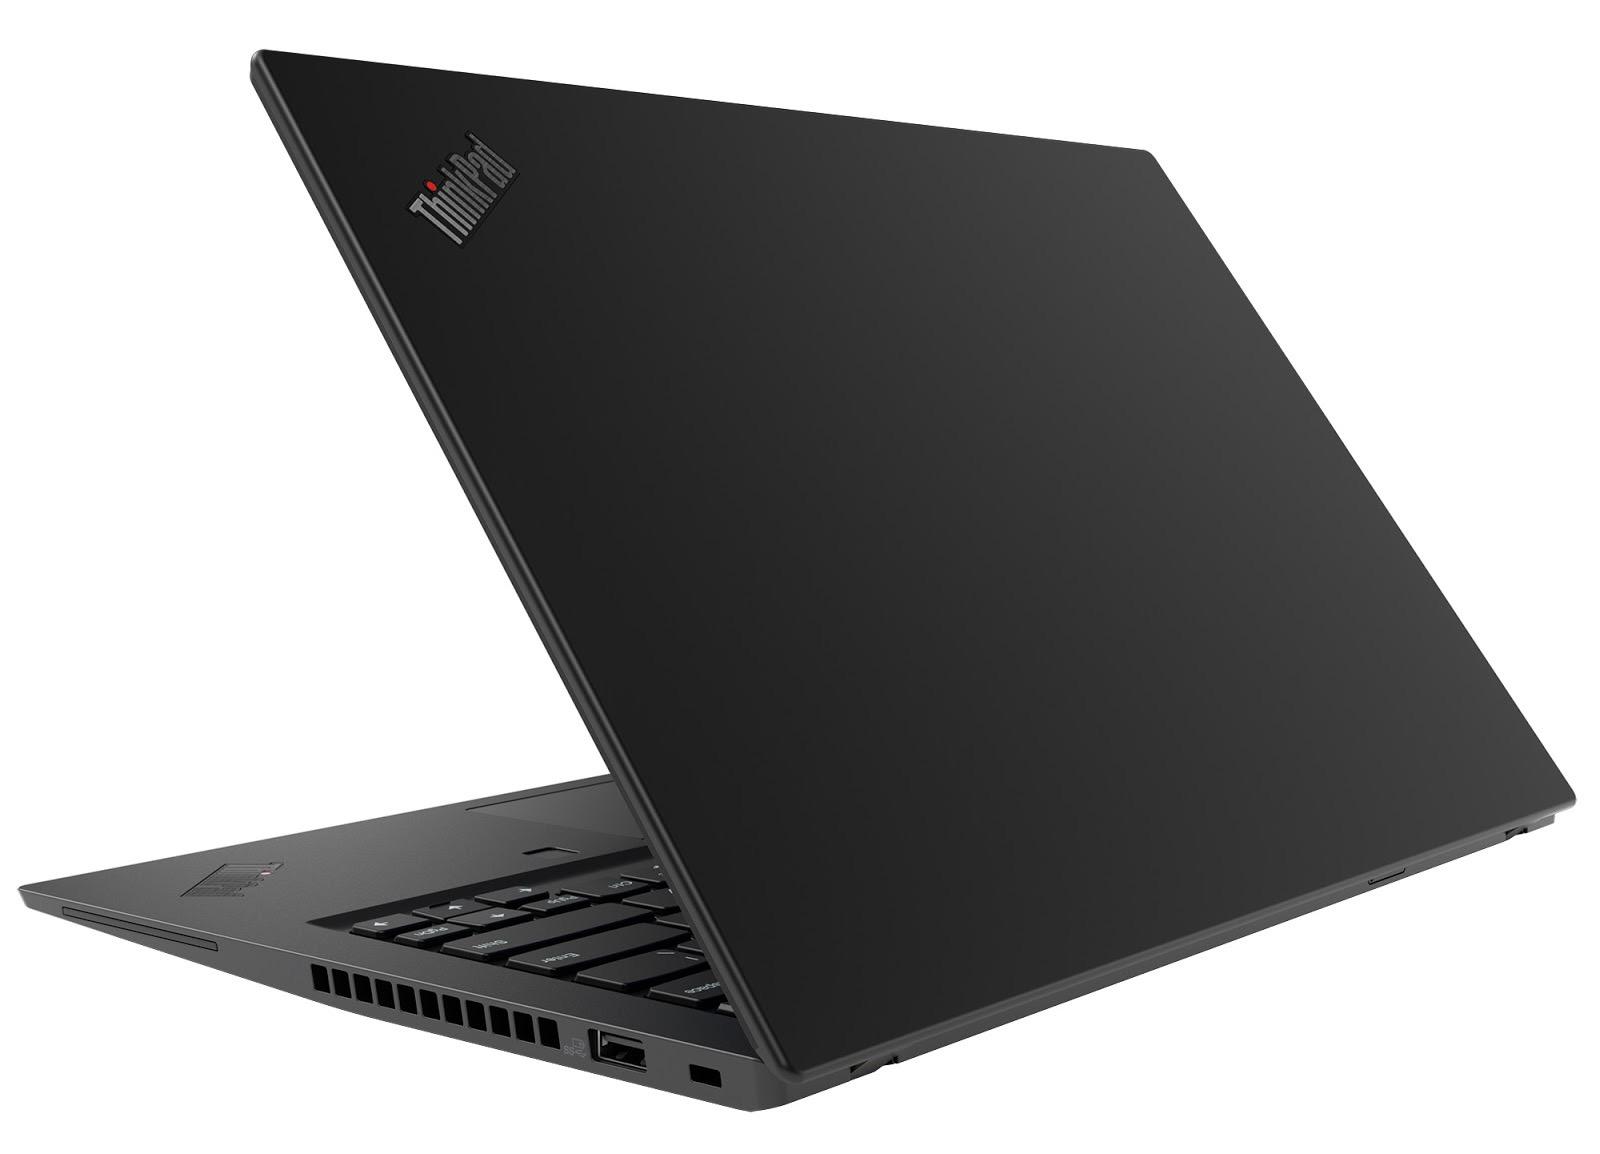 Фото 3. Ноутбук Lenovo ThinkPad T14 Gen 1 Black (20S00012RT)